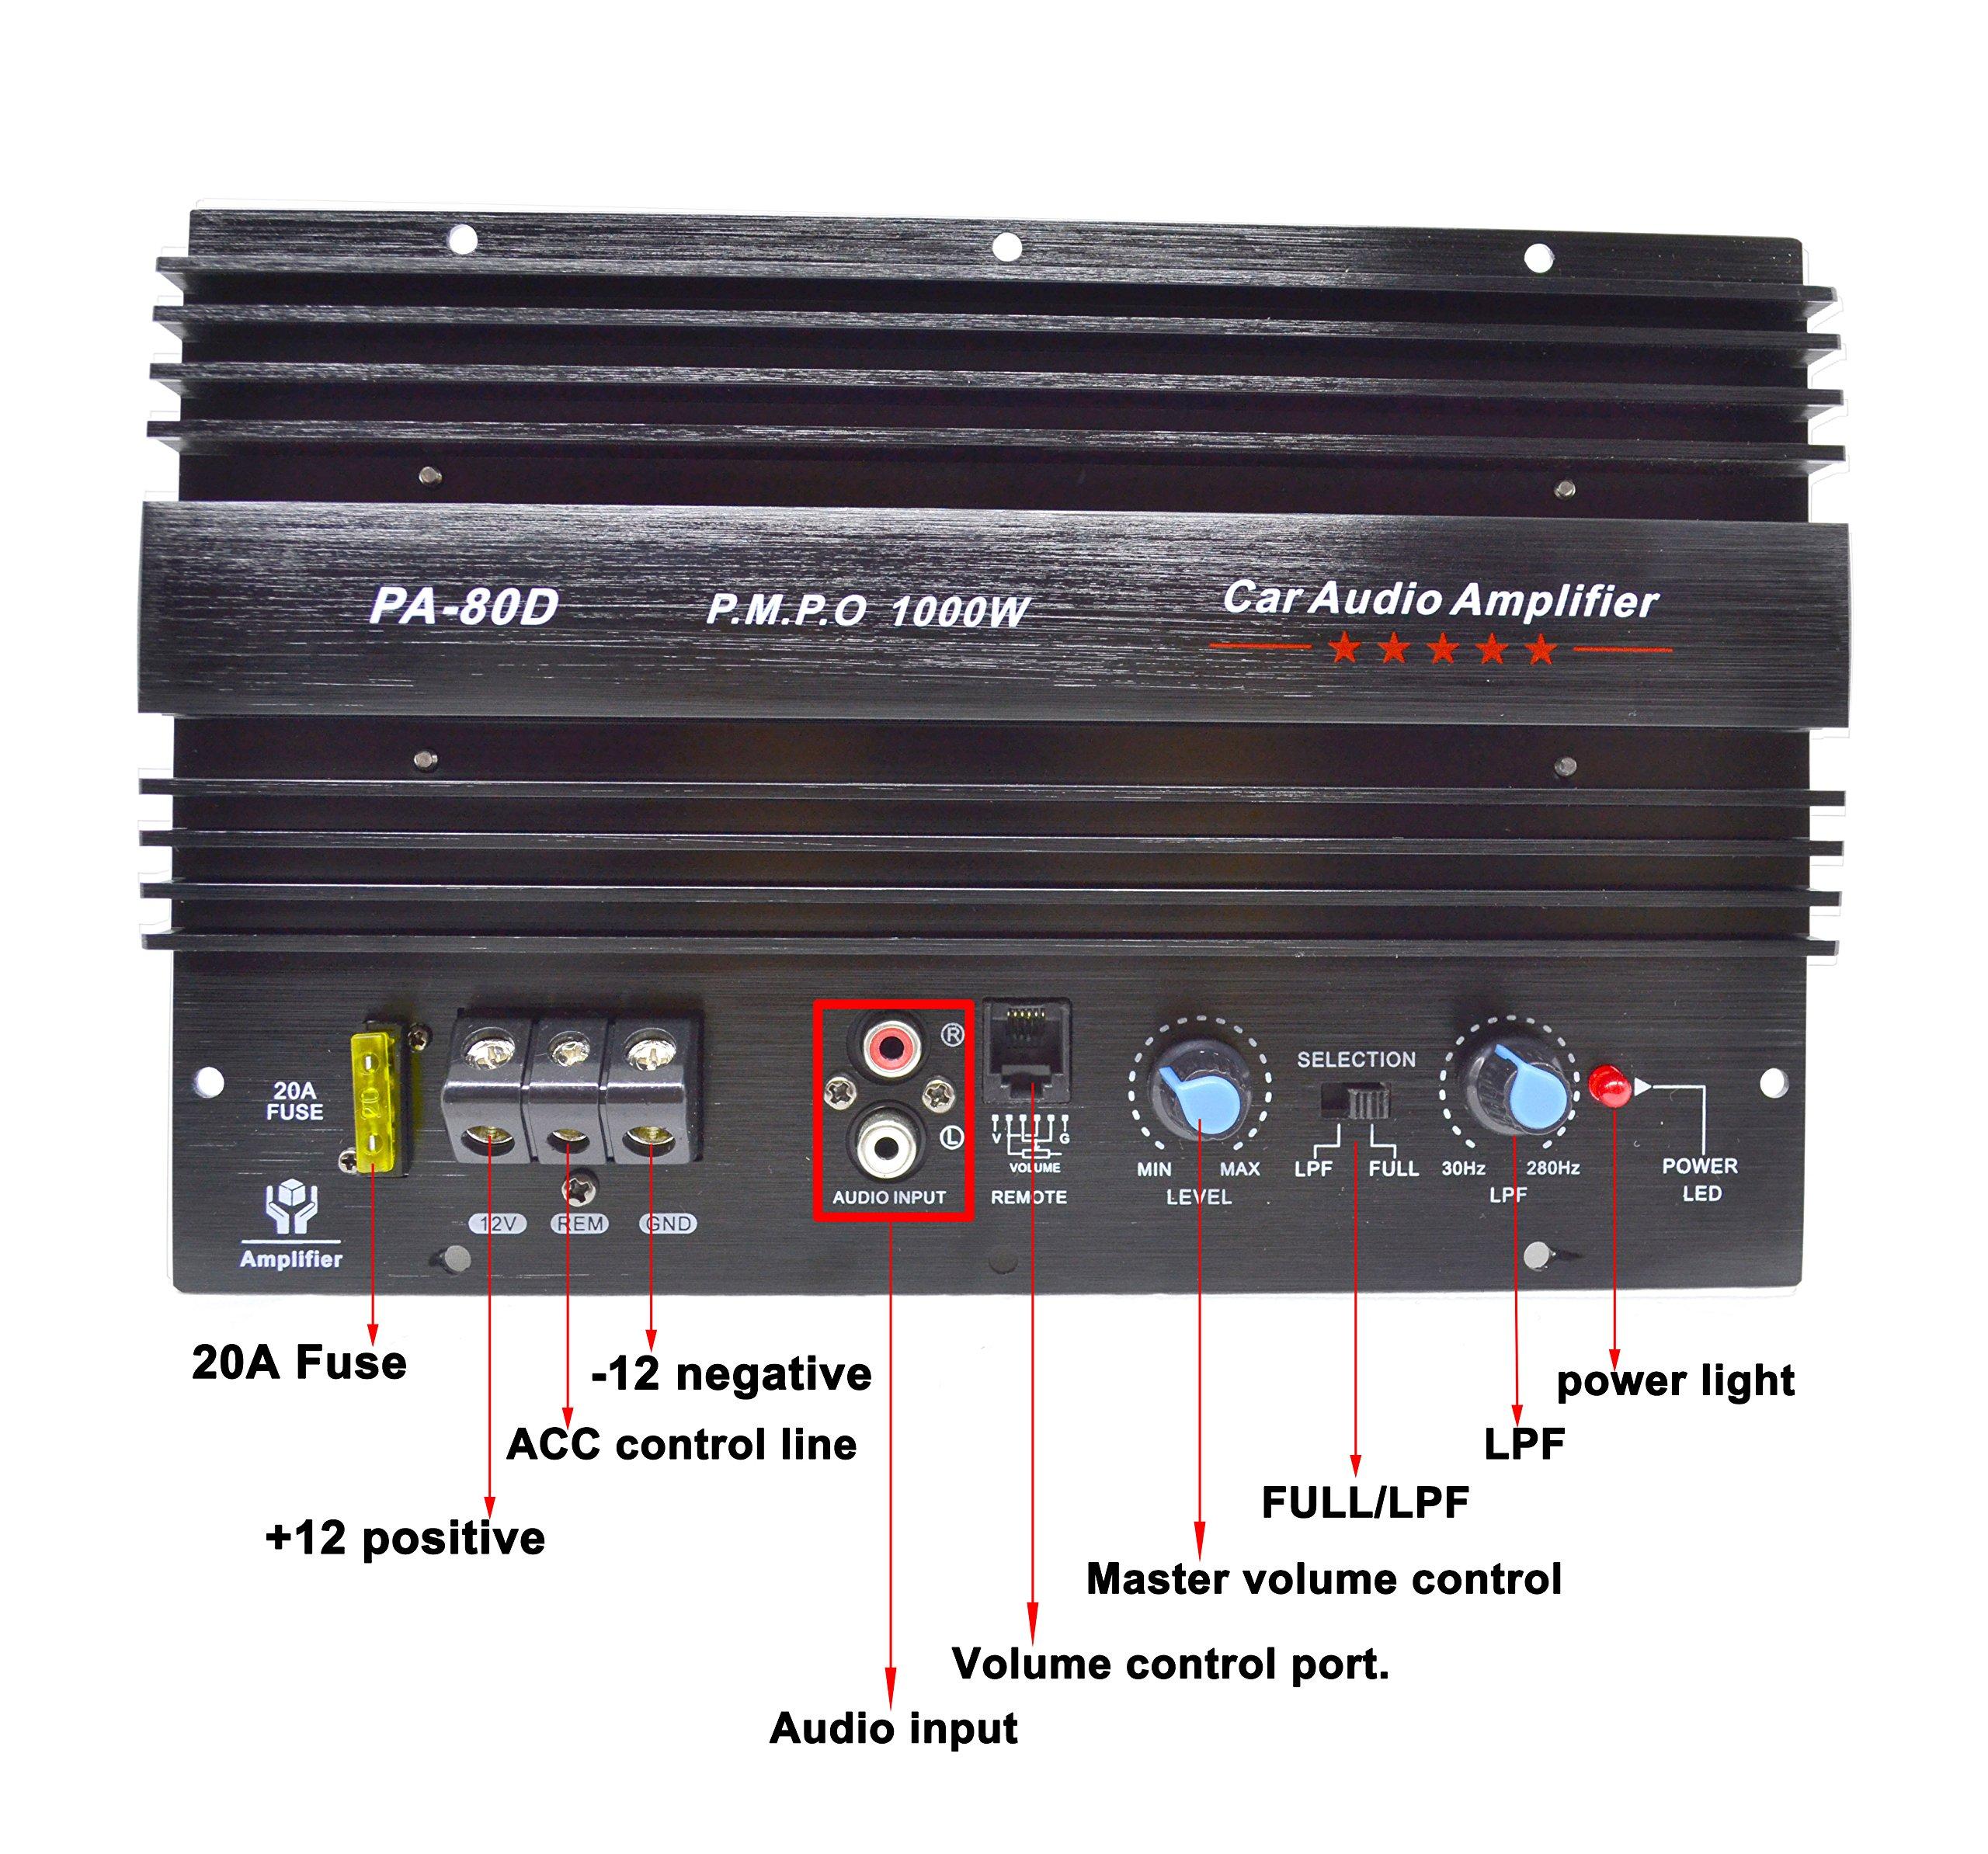 PA-80D Car Amplifie 1000W High Power Tube Amplifier Subwoofer Amplifier by bass audio (Image #2)